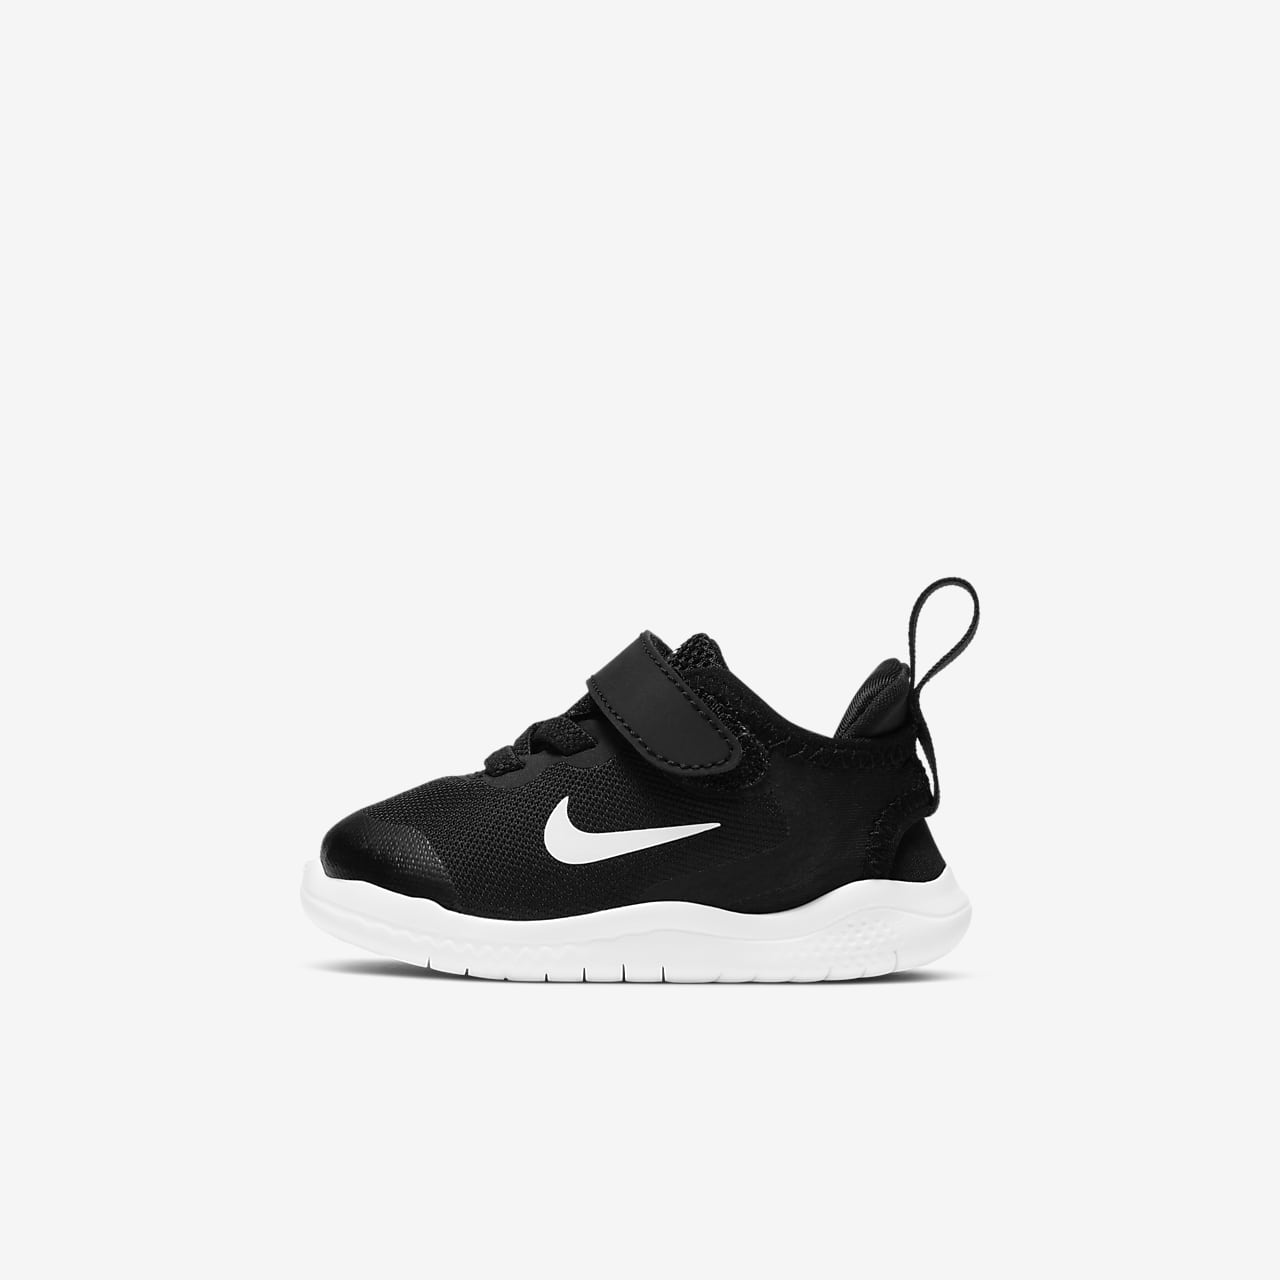 Scarpa Nike Free RN 2018 - Neonati Bimbi piccoli. Nike.com IT 90acd880c2e